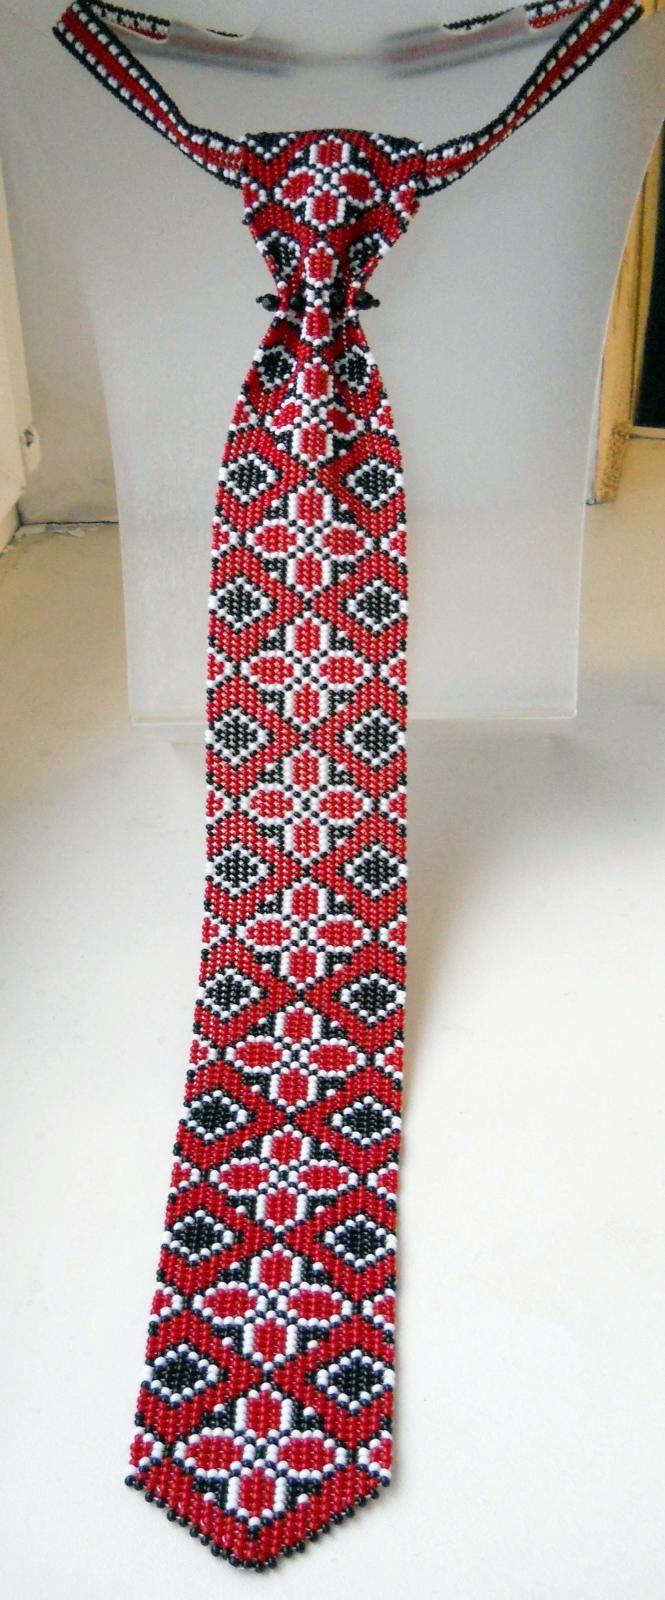 "Мужской бисерный галстук ""Славянский"" - Beadloomed man's tie in traditional Ukrainian gerdan pattern"